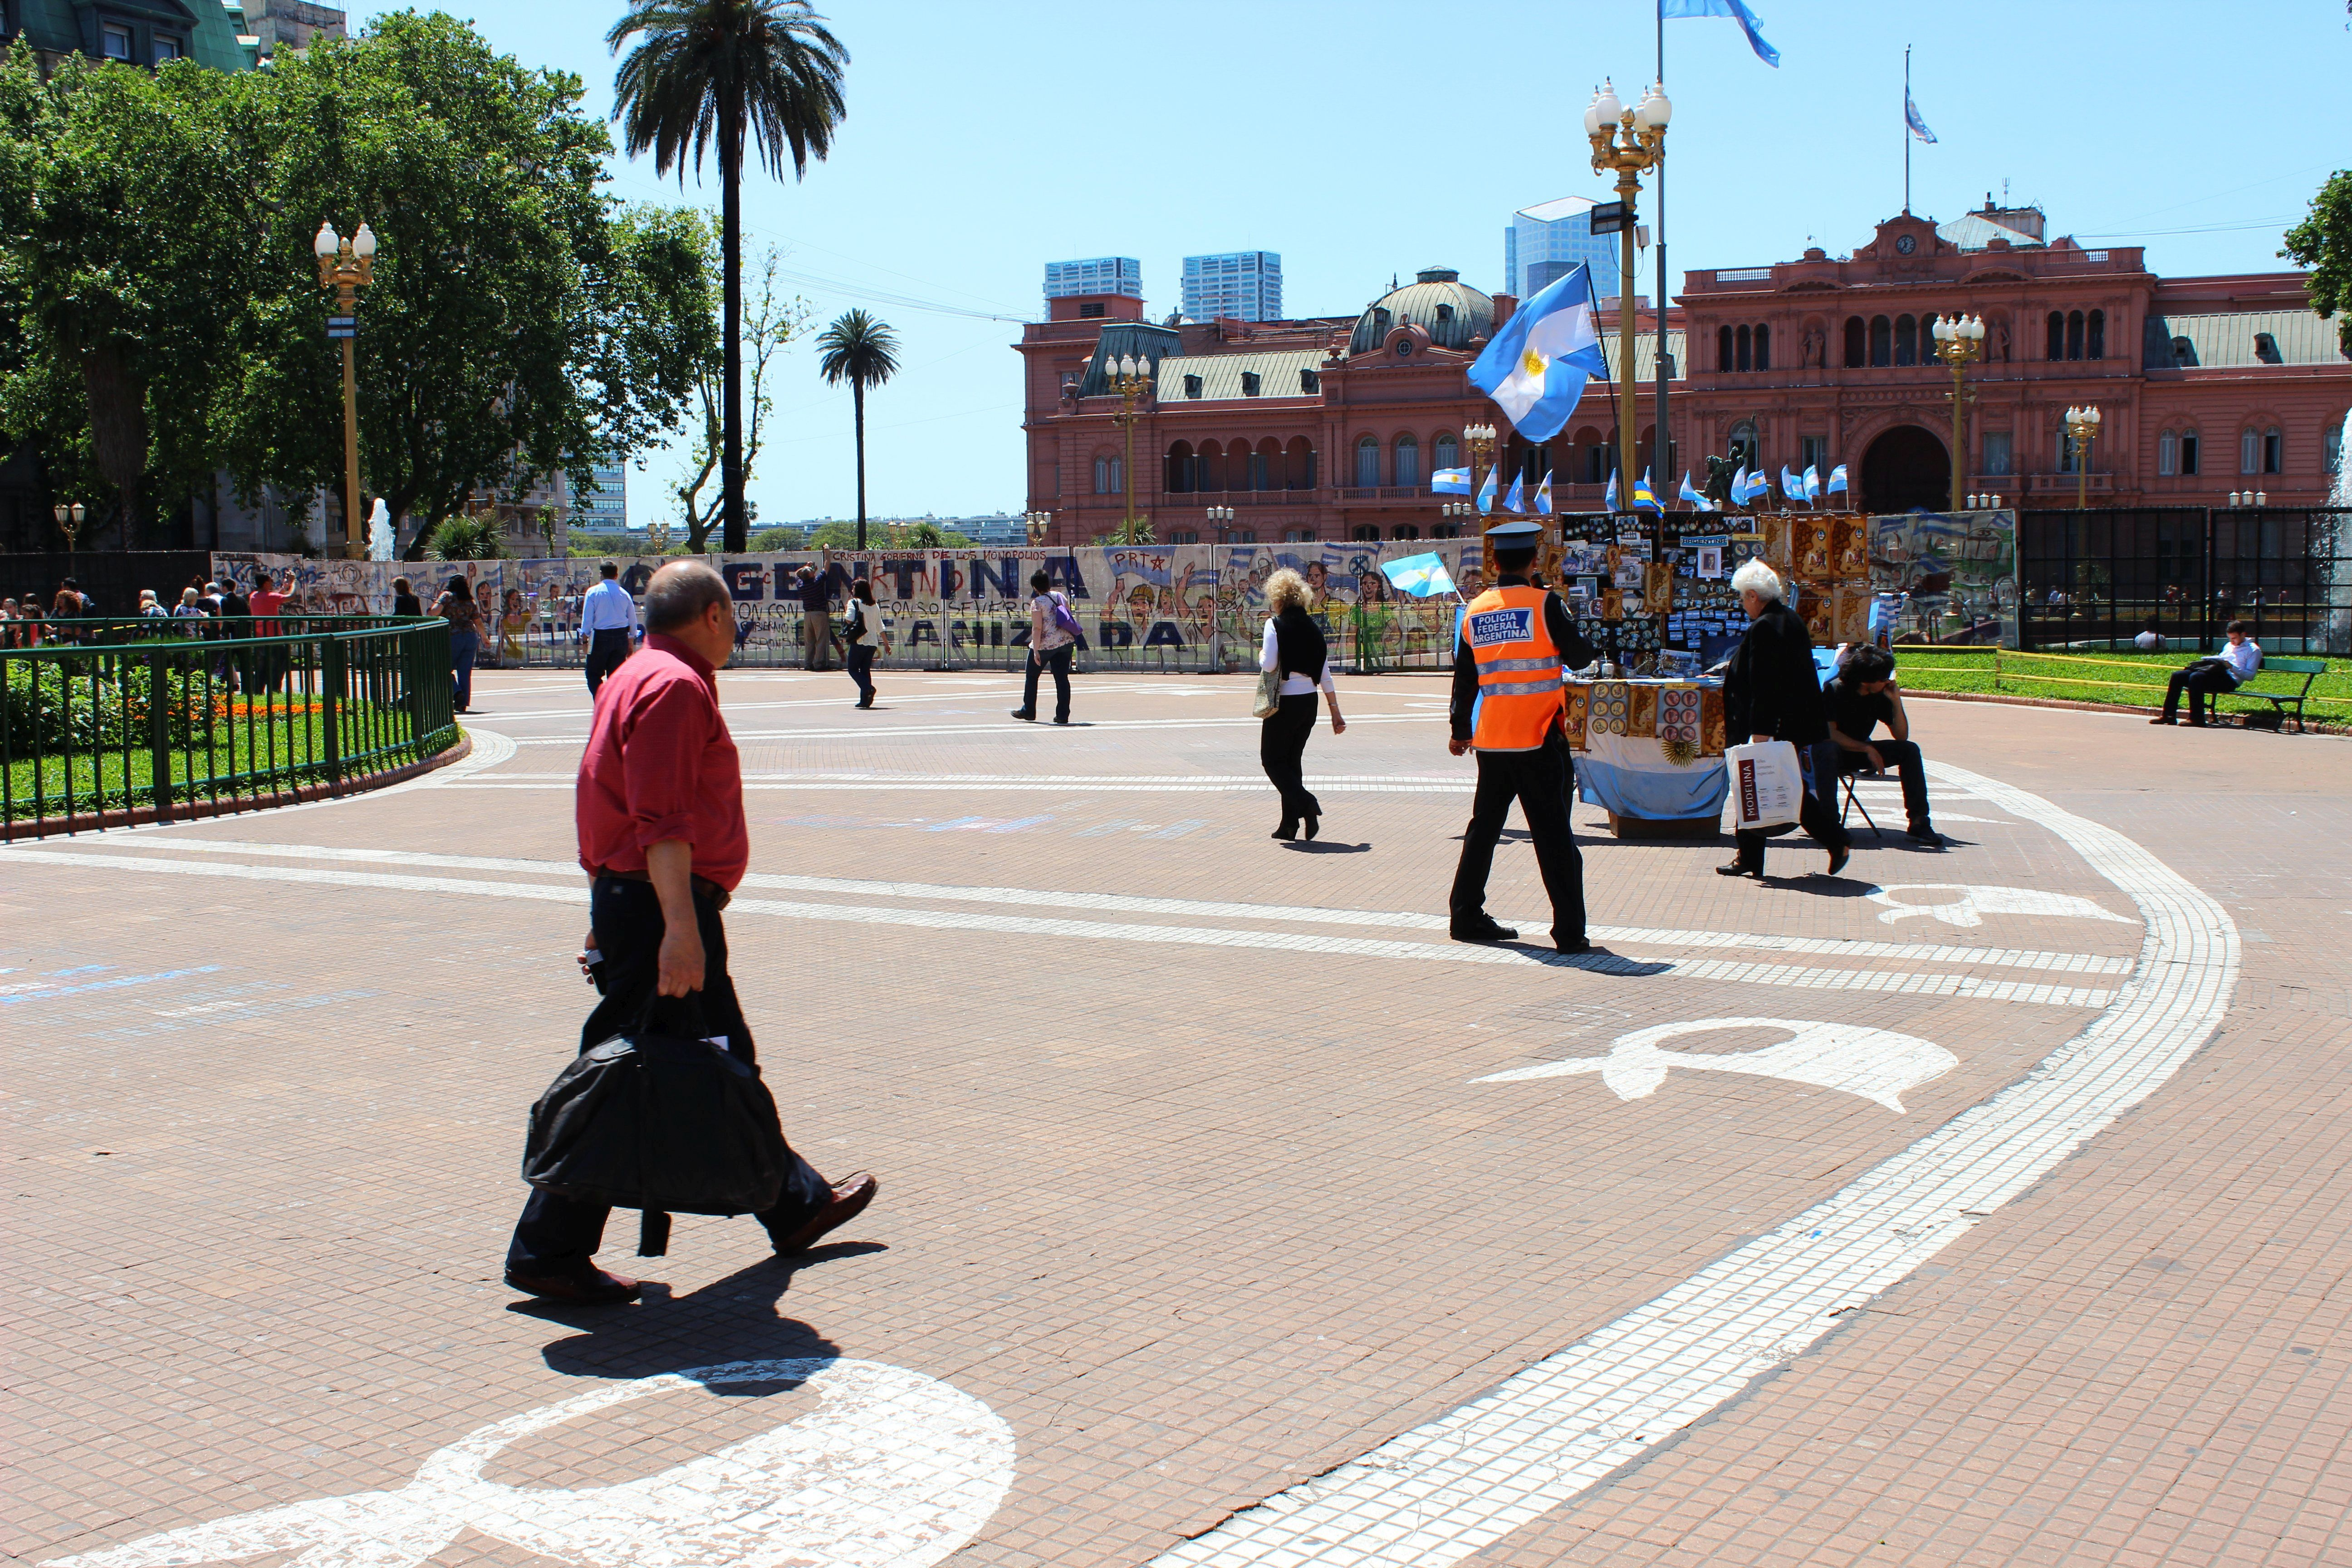 Argentína, Buenos Aires-Május tér - Fotó: Papp Éva